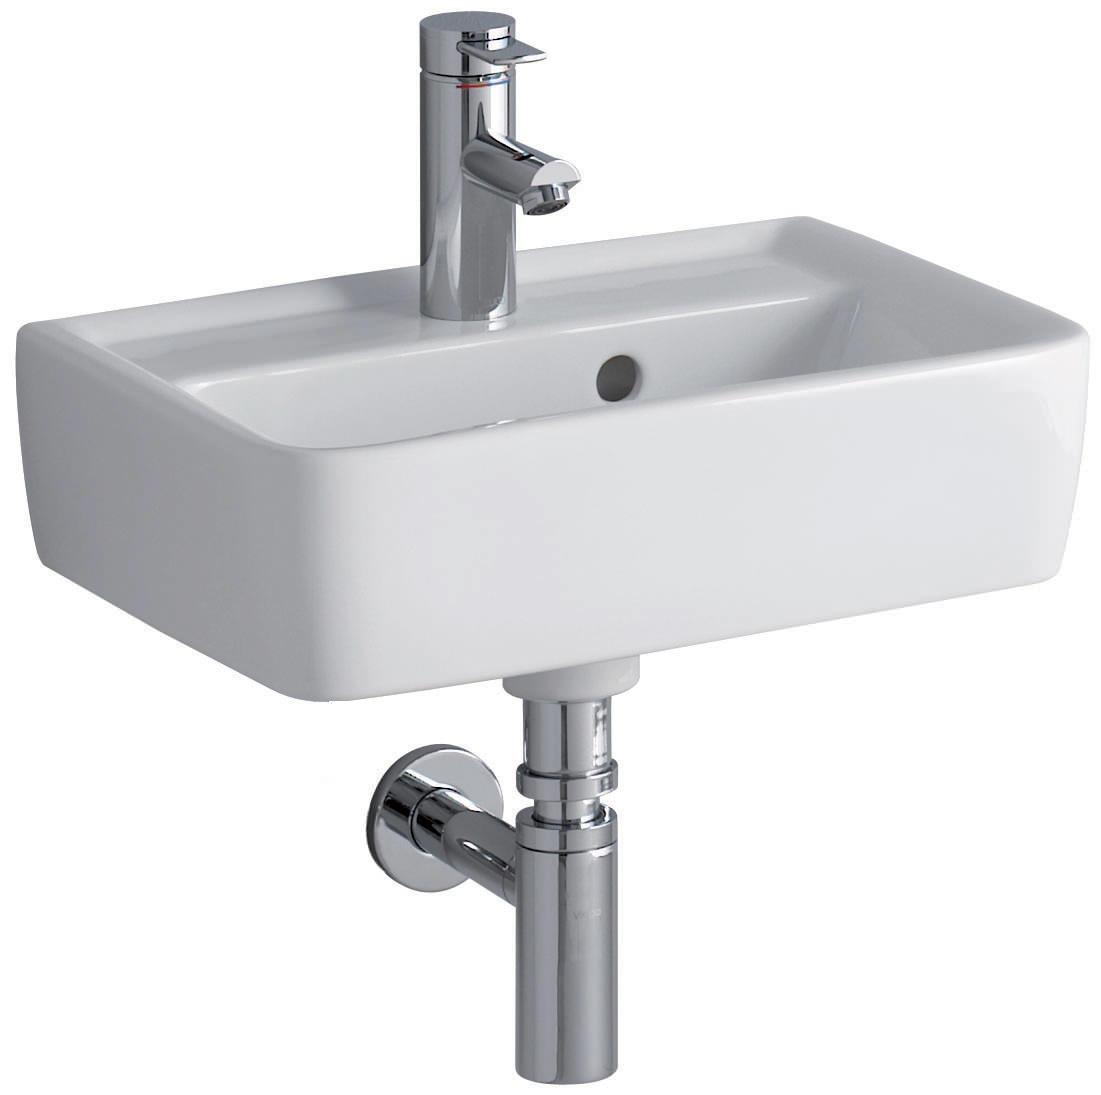 Twyford galerie plan wall fixing washbasin 500 x 380mm - Keramag for you ...